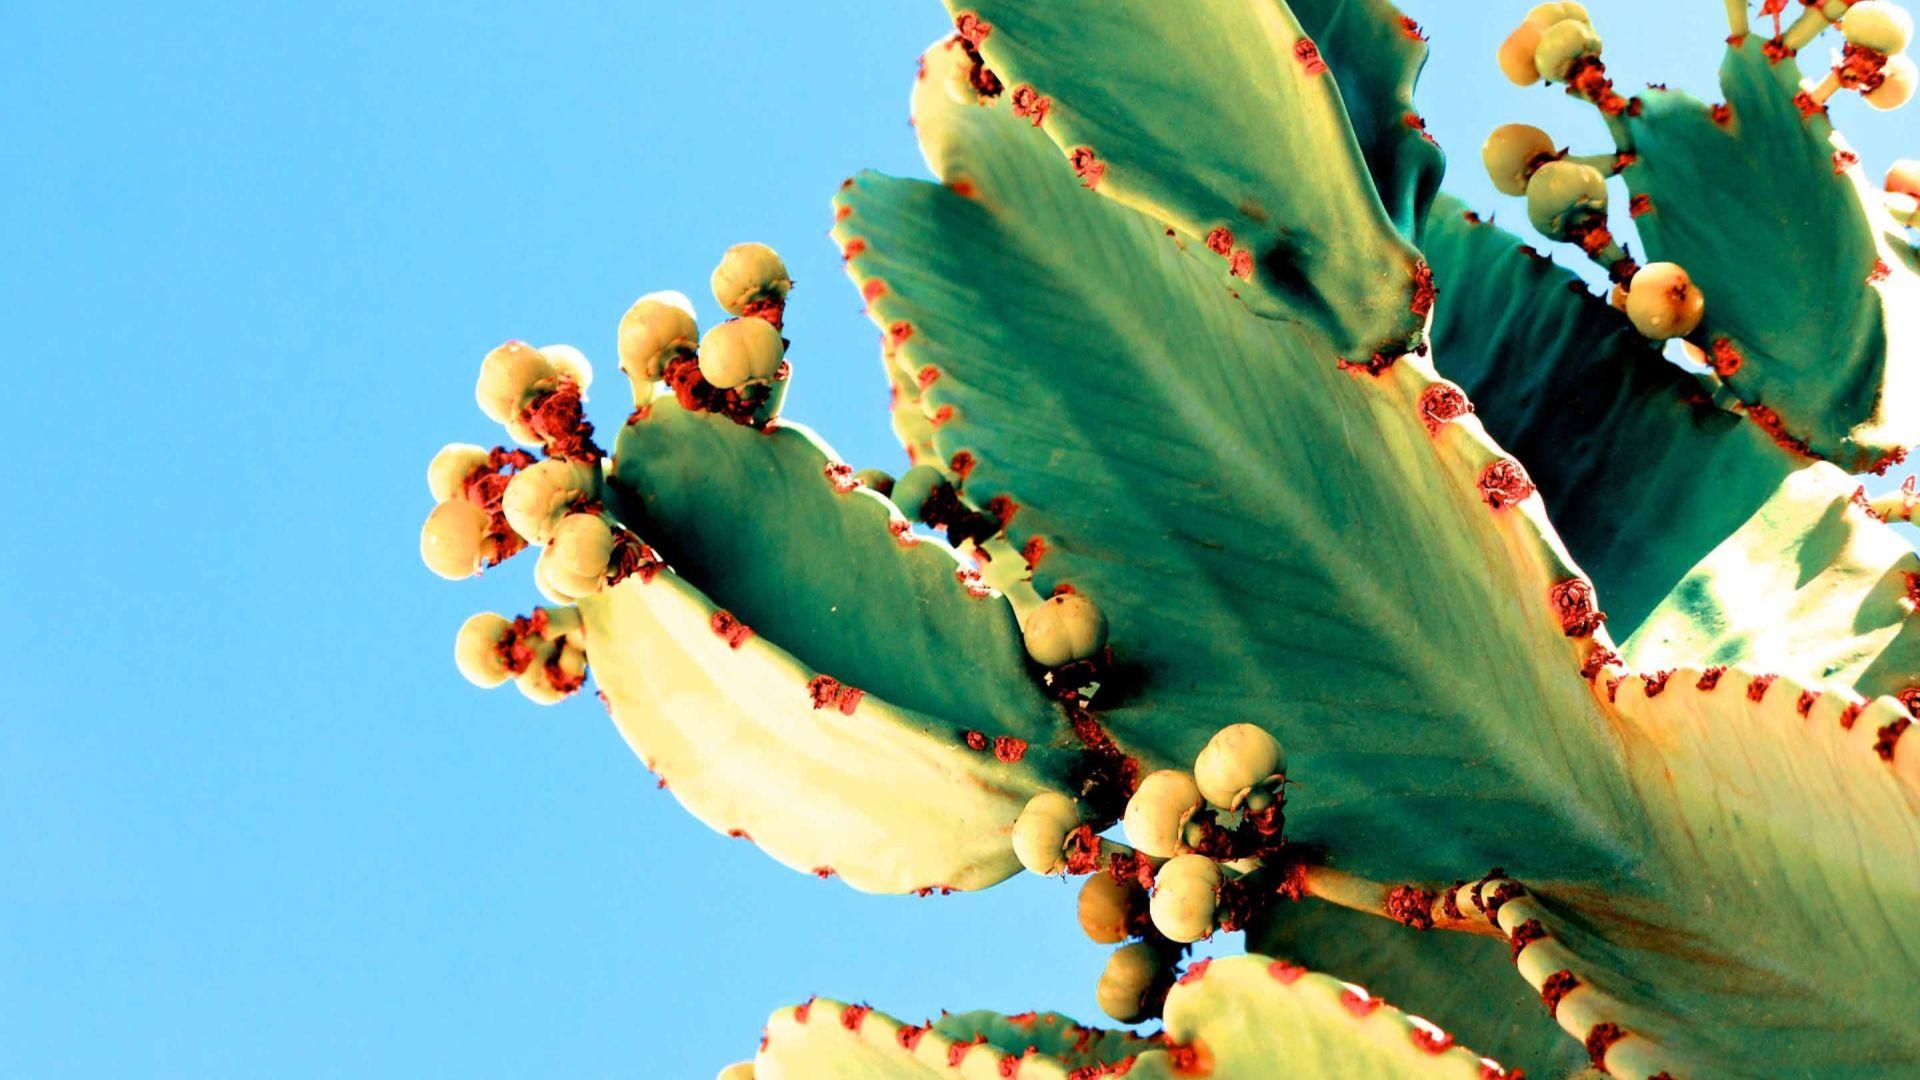 Cactus Good Wallpaper